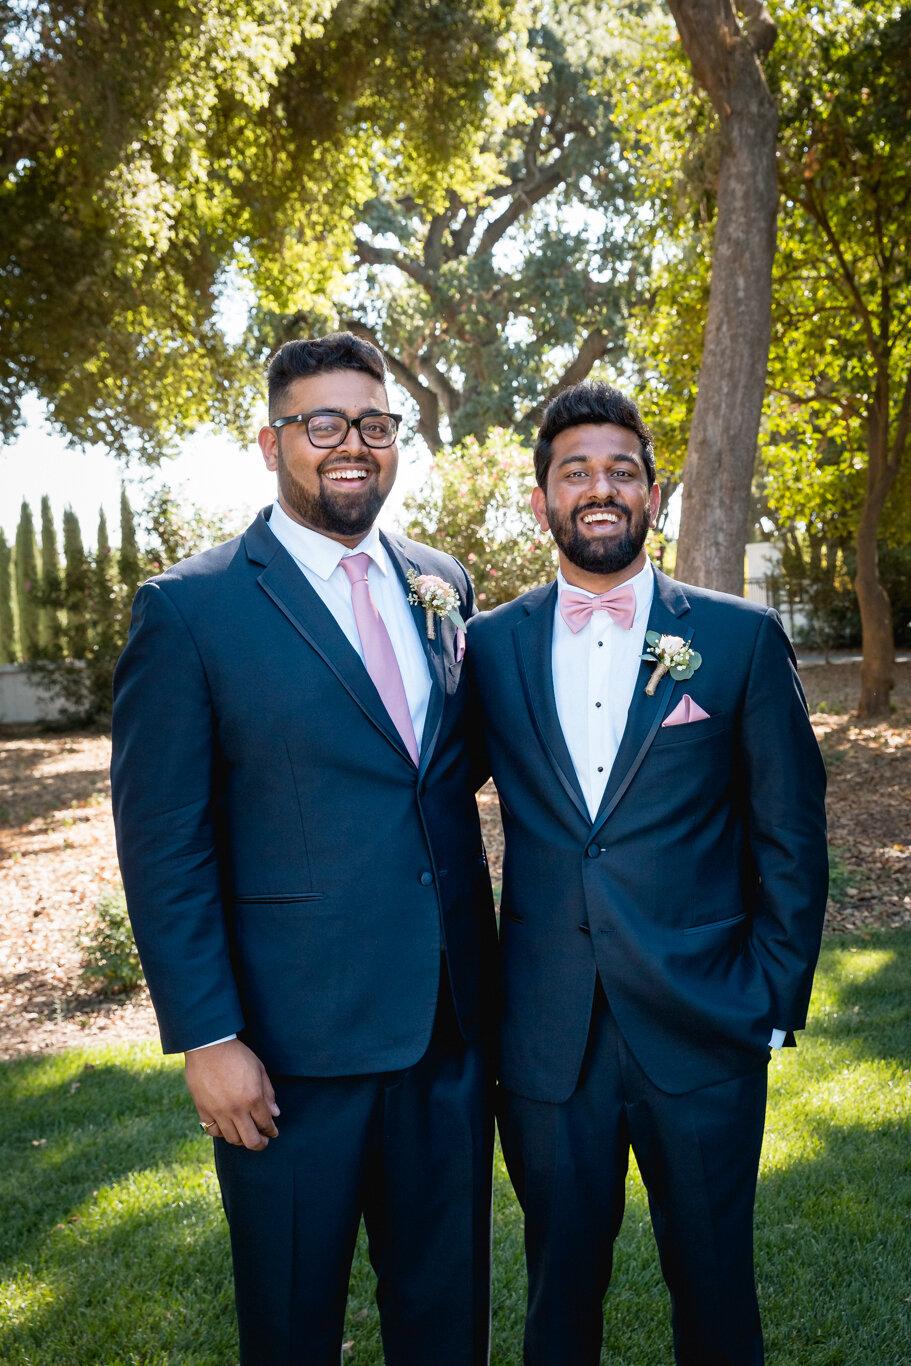 2019.08.24_Emily-Ashir-Wedding-at-the-Maples-5556.jpg